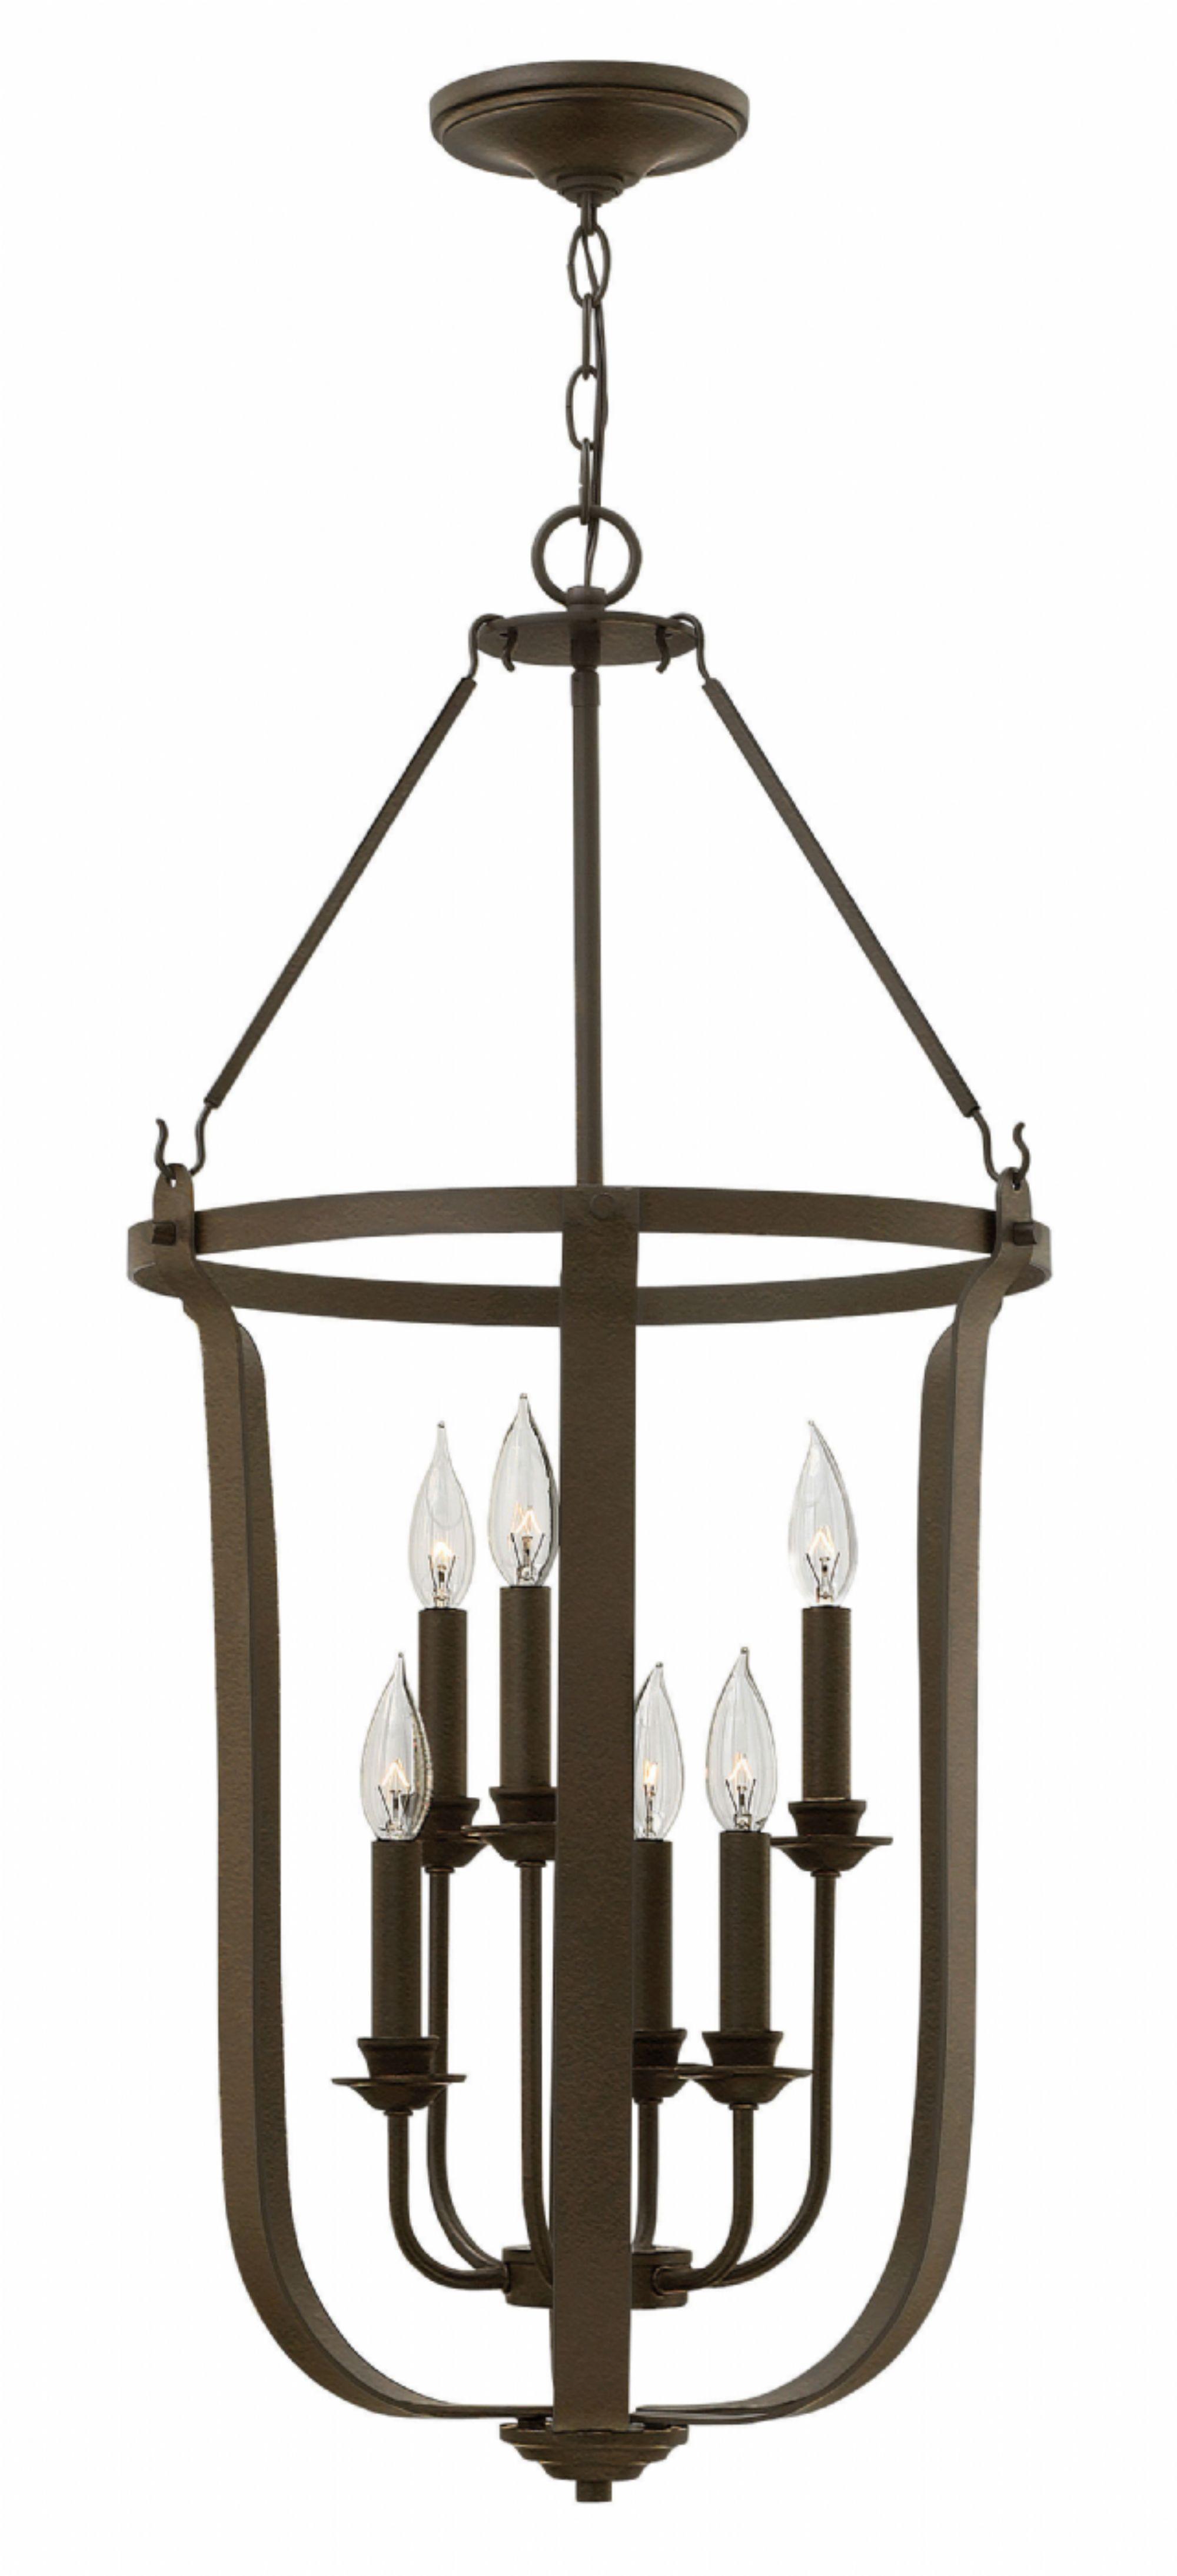 Cleadon 6-Light Urn Pendant